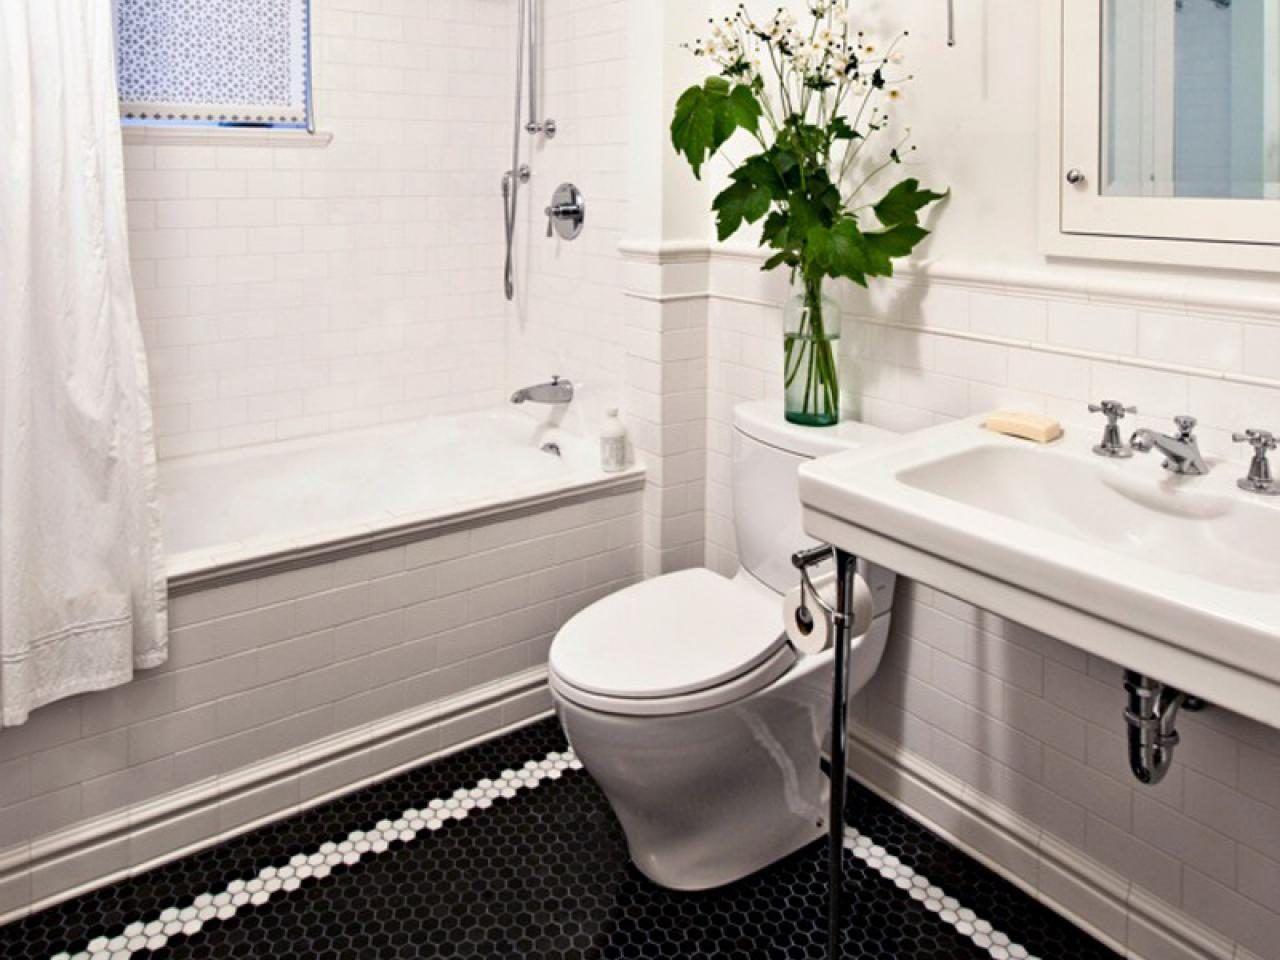 stunning best lighting for bathroom vanity décor-Fresh Best Lighting for Bathroom Vanity Concept